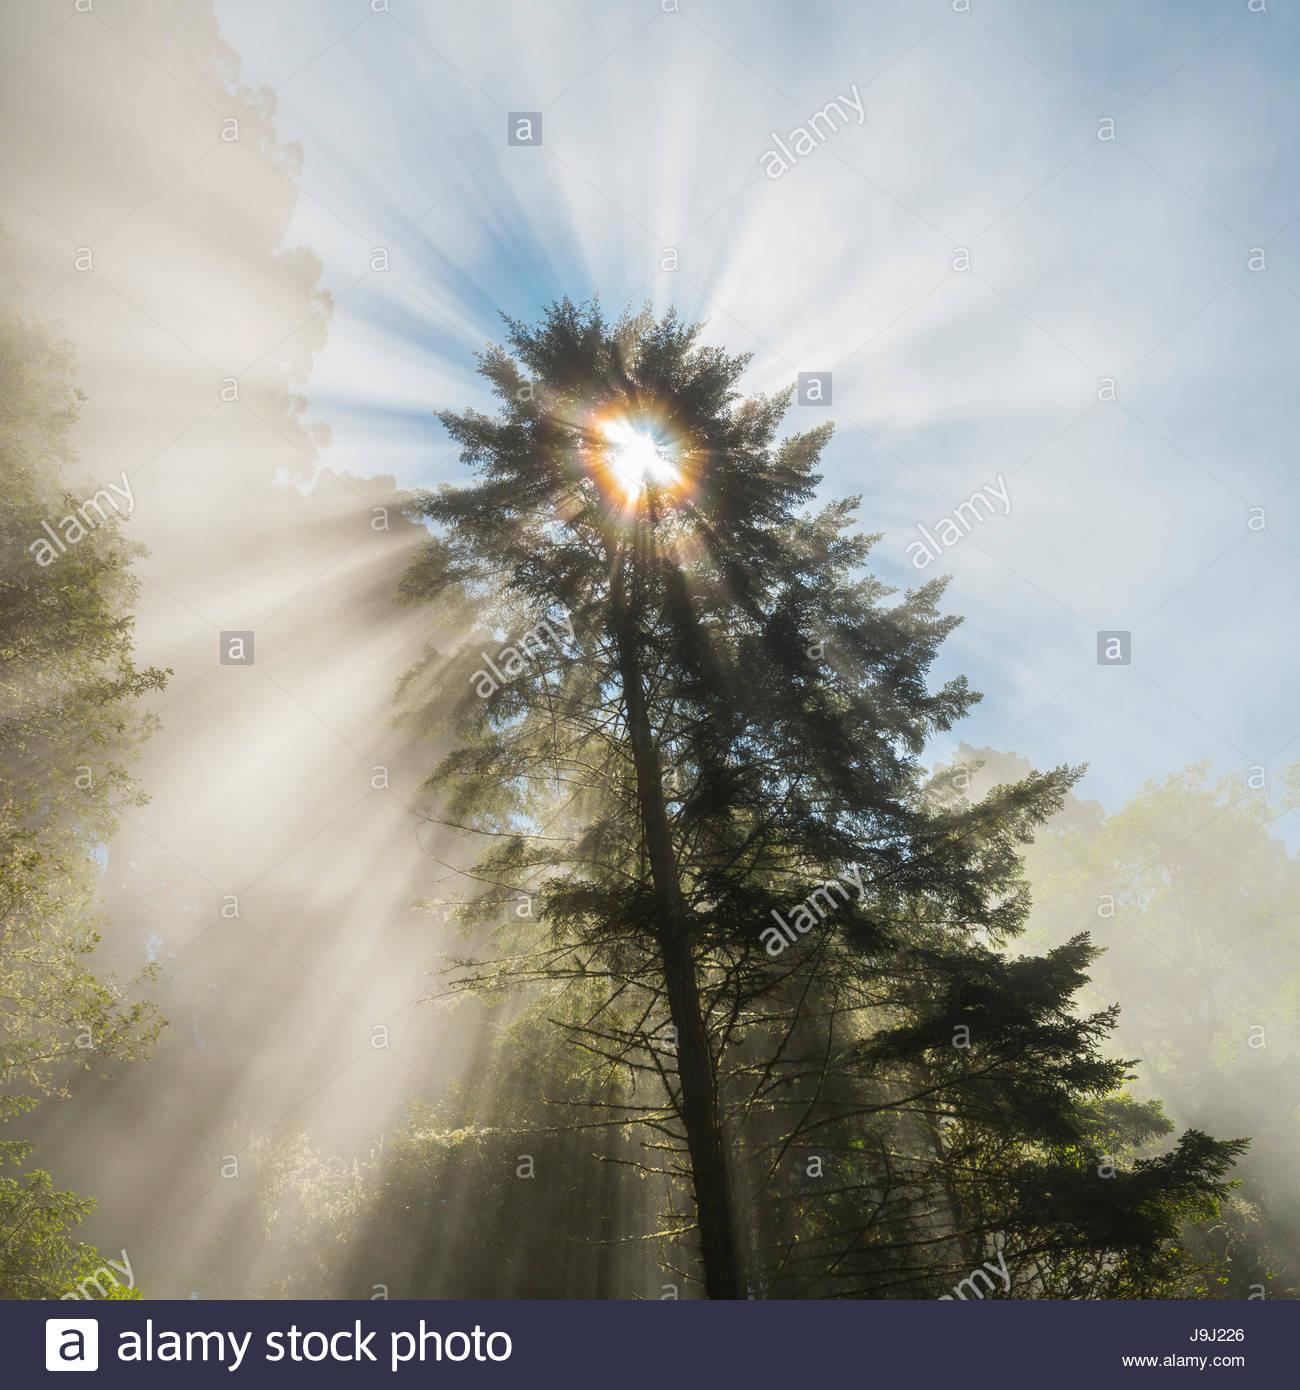 Sun shines through the fog surrounding a redwood tree. - Stock Image